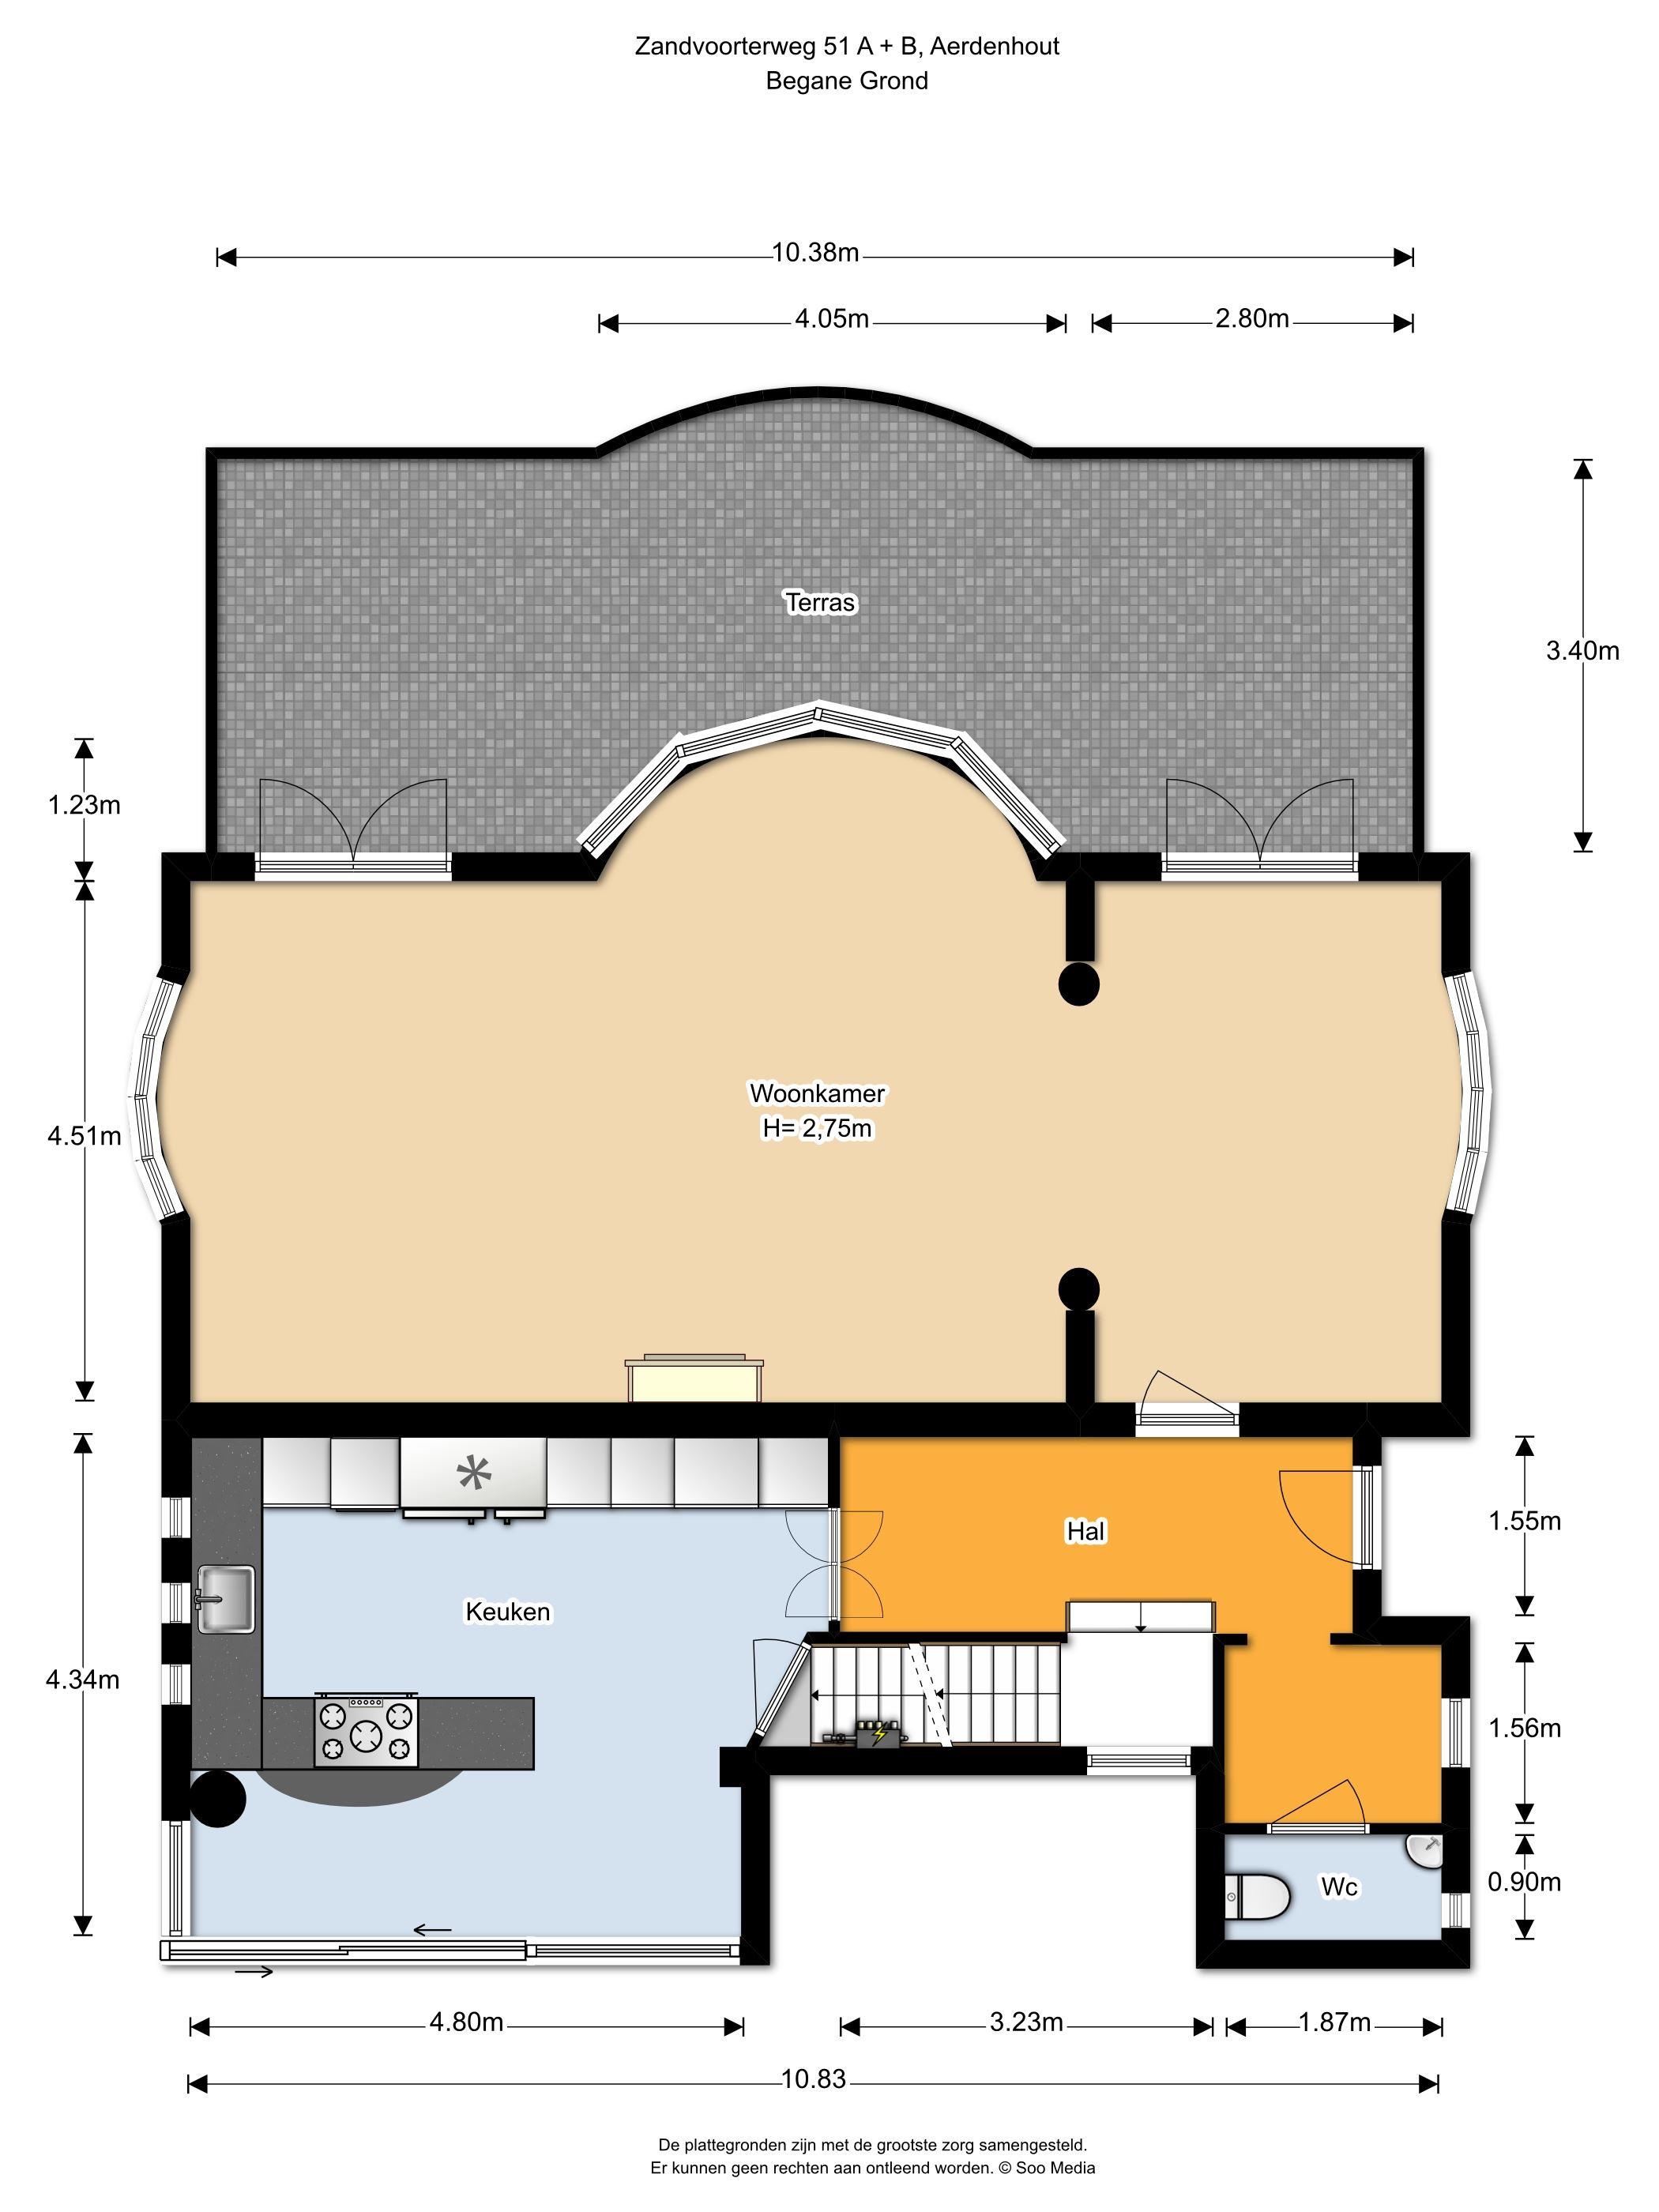 Huis Te Koop Zandvoorterweg 51 A B 2111 Gs Aerdenhout Funda